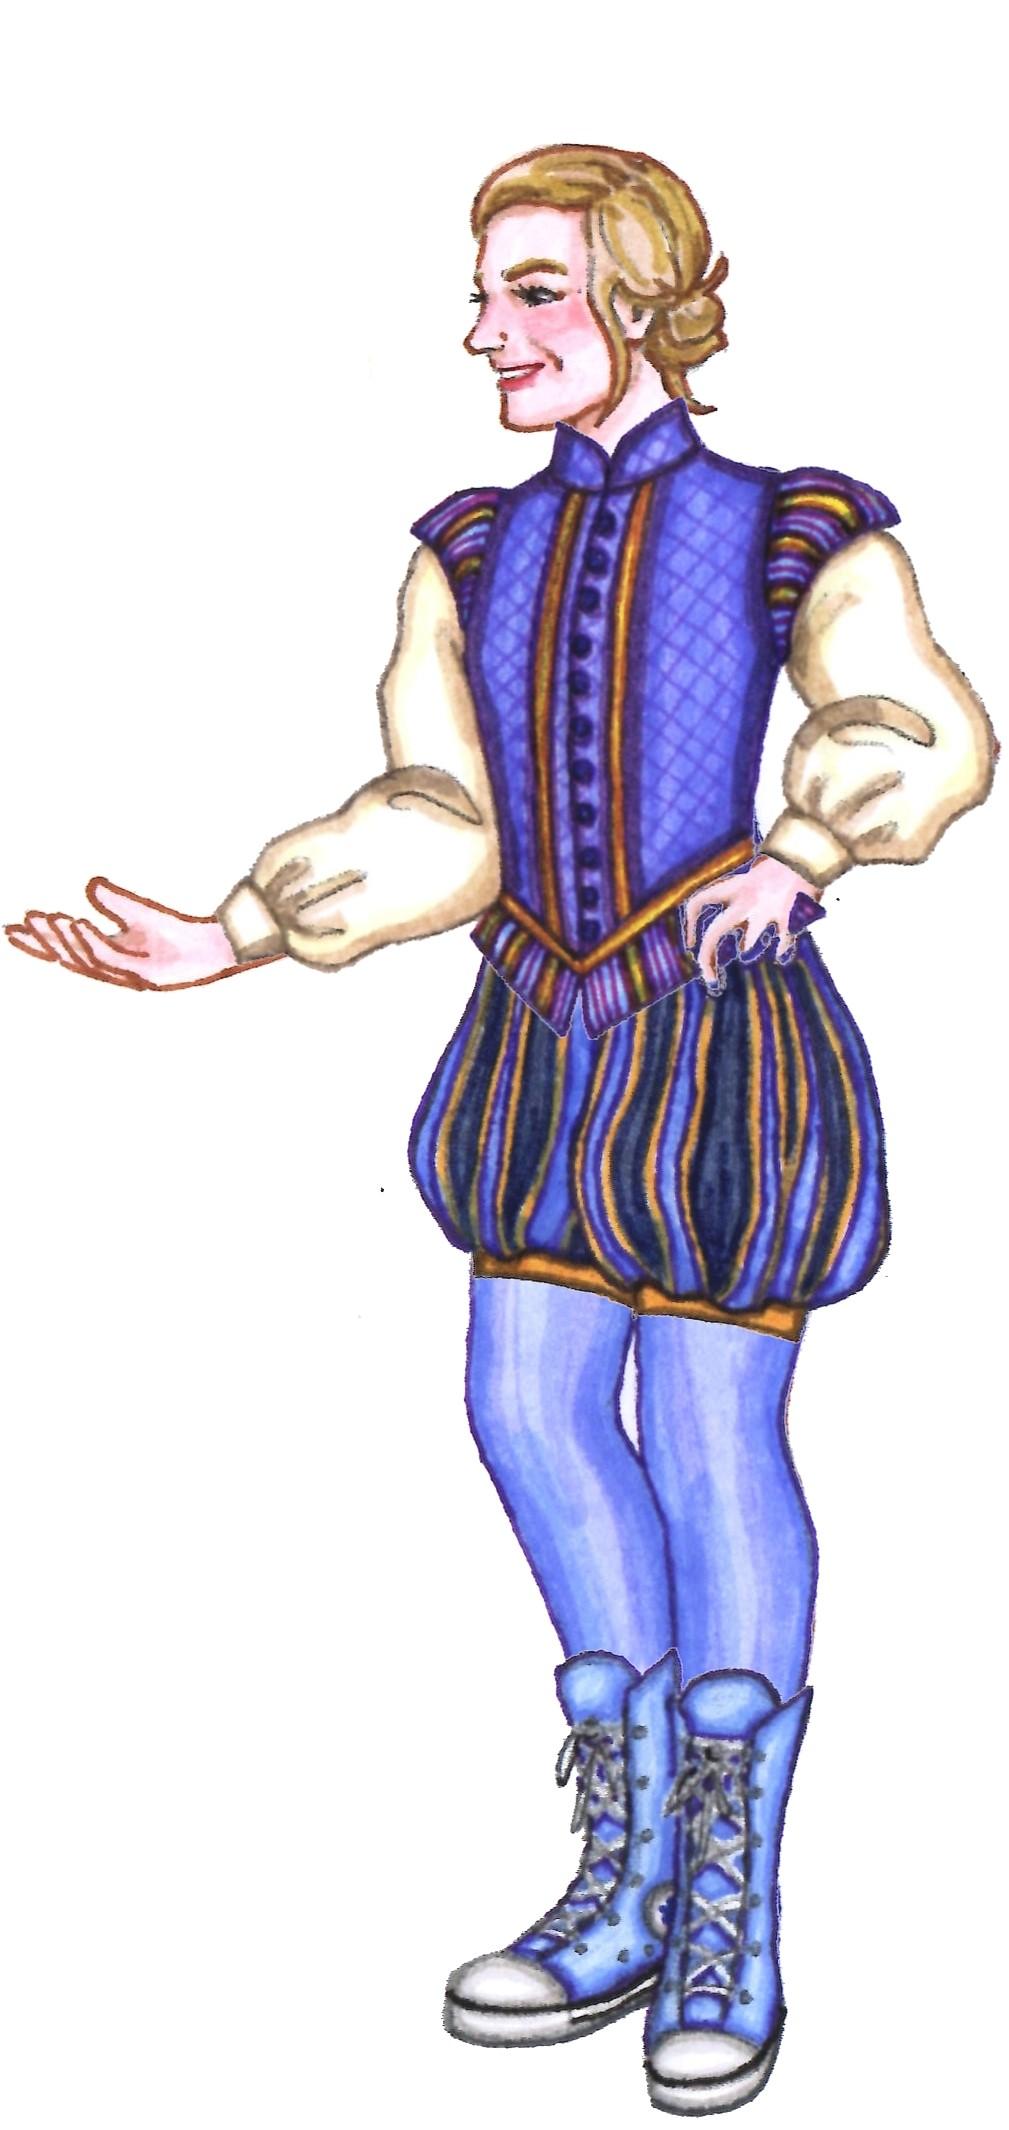 - *Romeo and Juliet*: the Prince -> Friar*Titus Andronicus*: Titus~Comedies~: Princess -> Merchant*MacBeth*: MacBeth*Antony & Cleopatra*: Marc Antony~Histories~: King John -> King Henry IV*Hamlet*: Hamlet